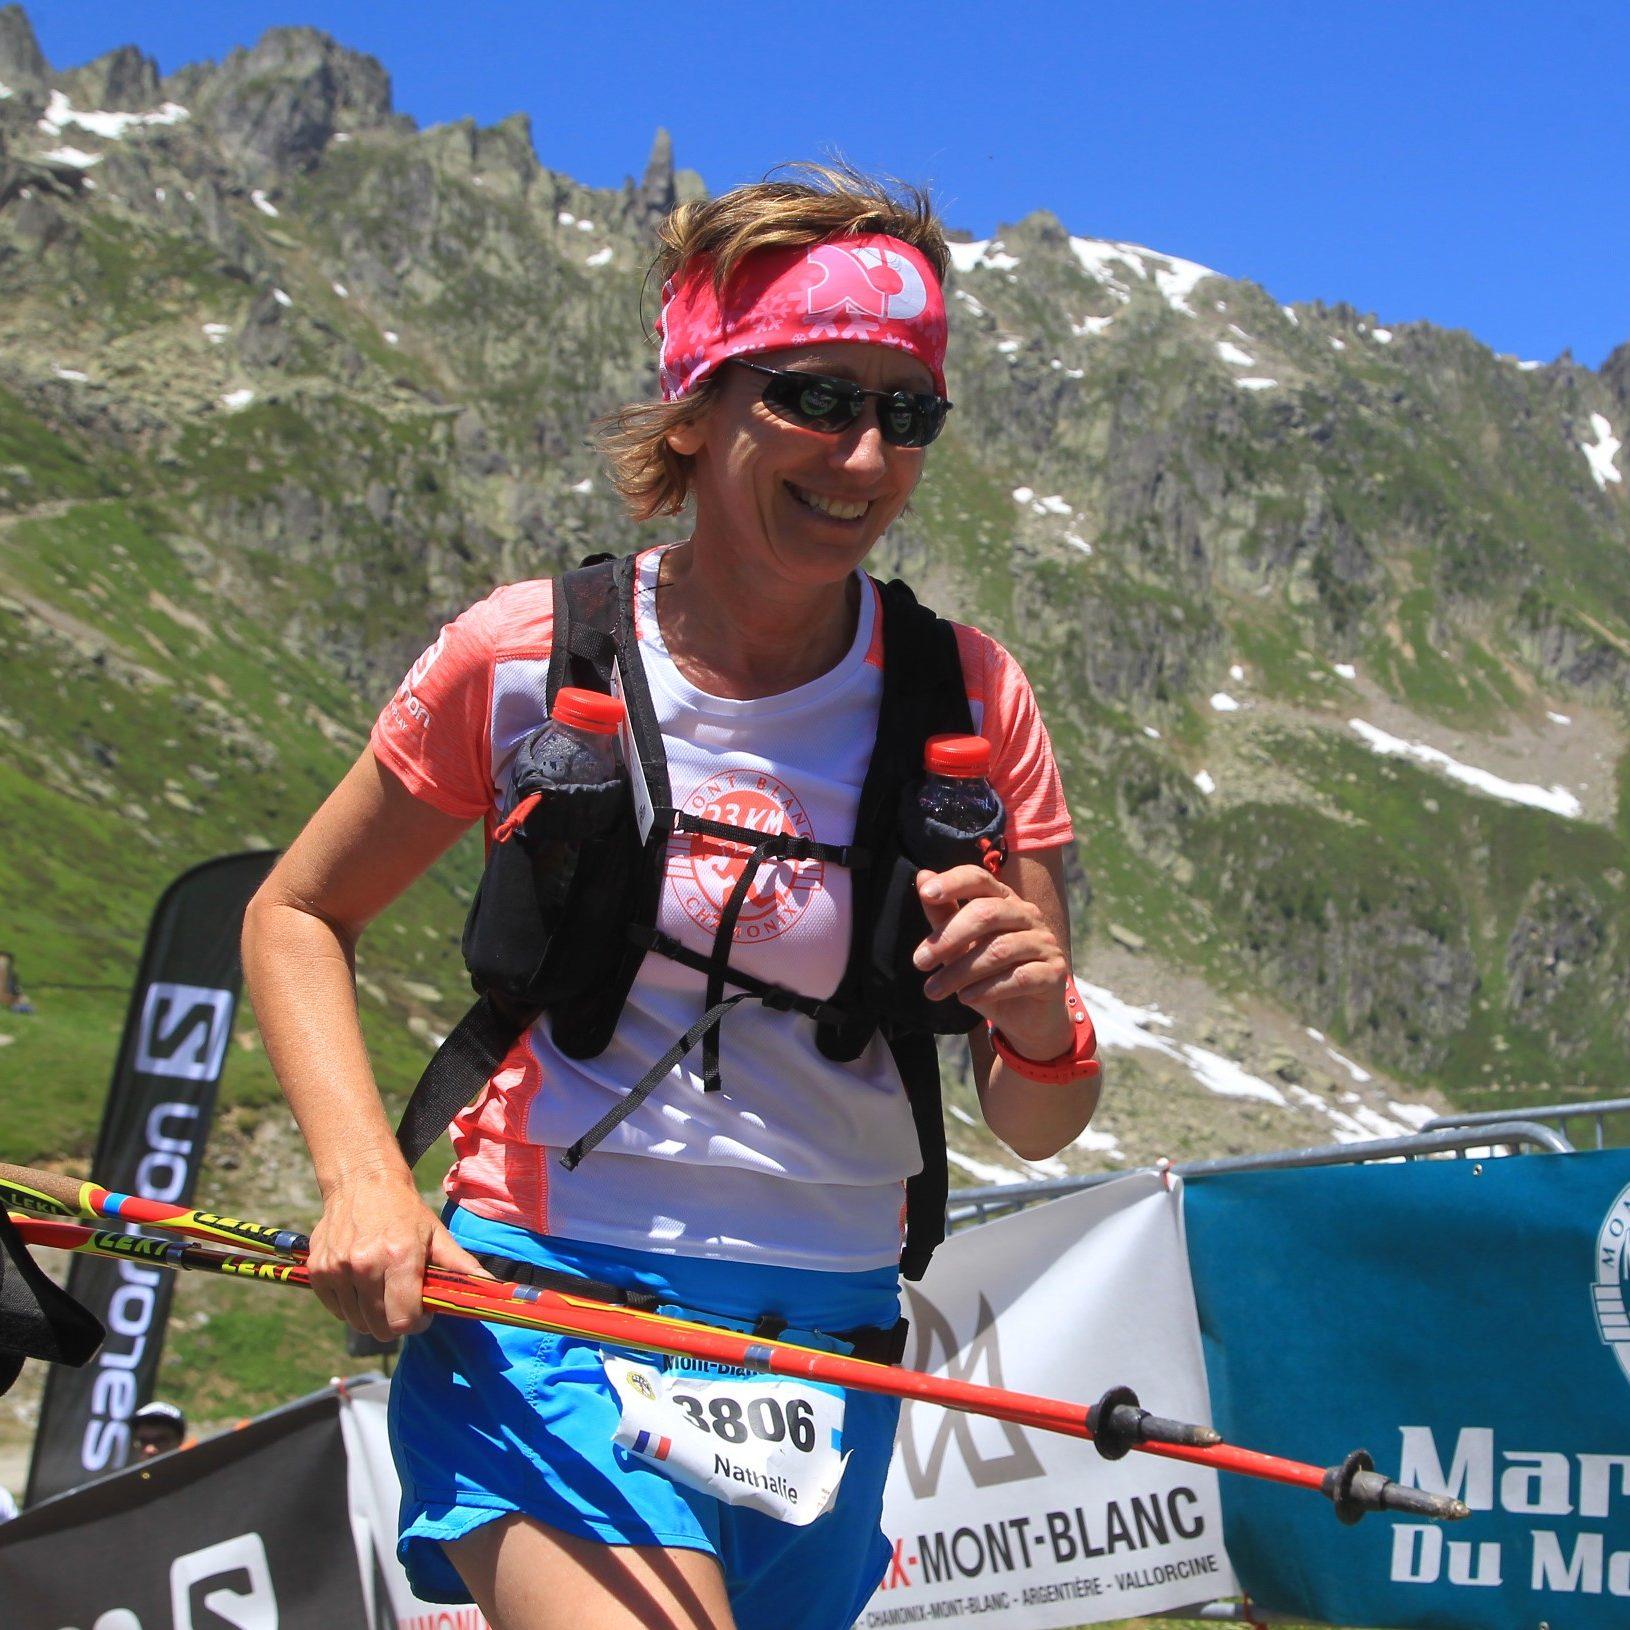 Nathalie Prudent - Membre du CA